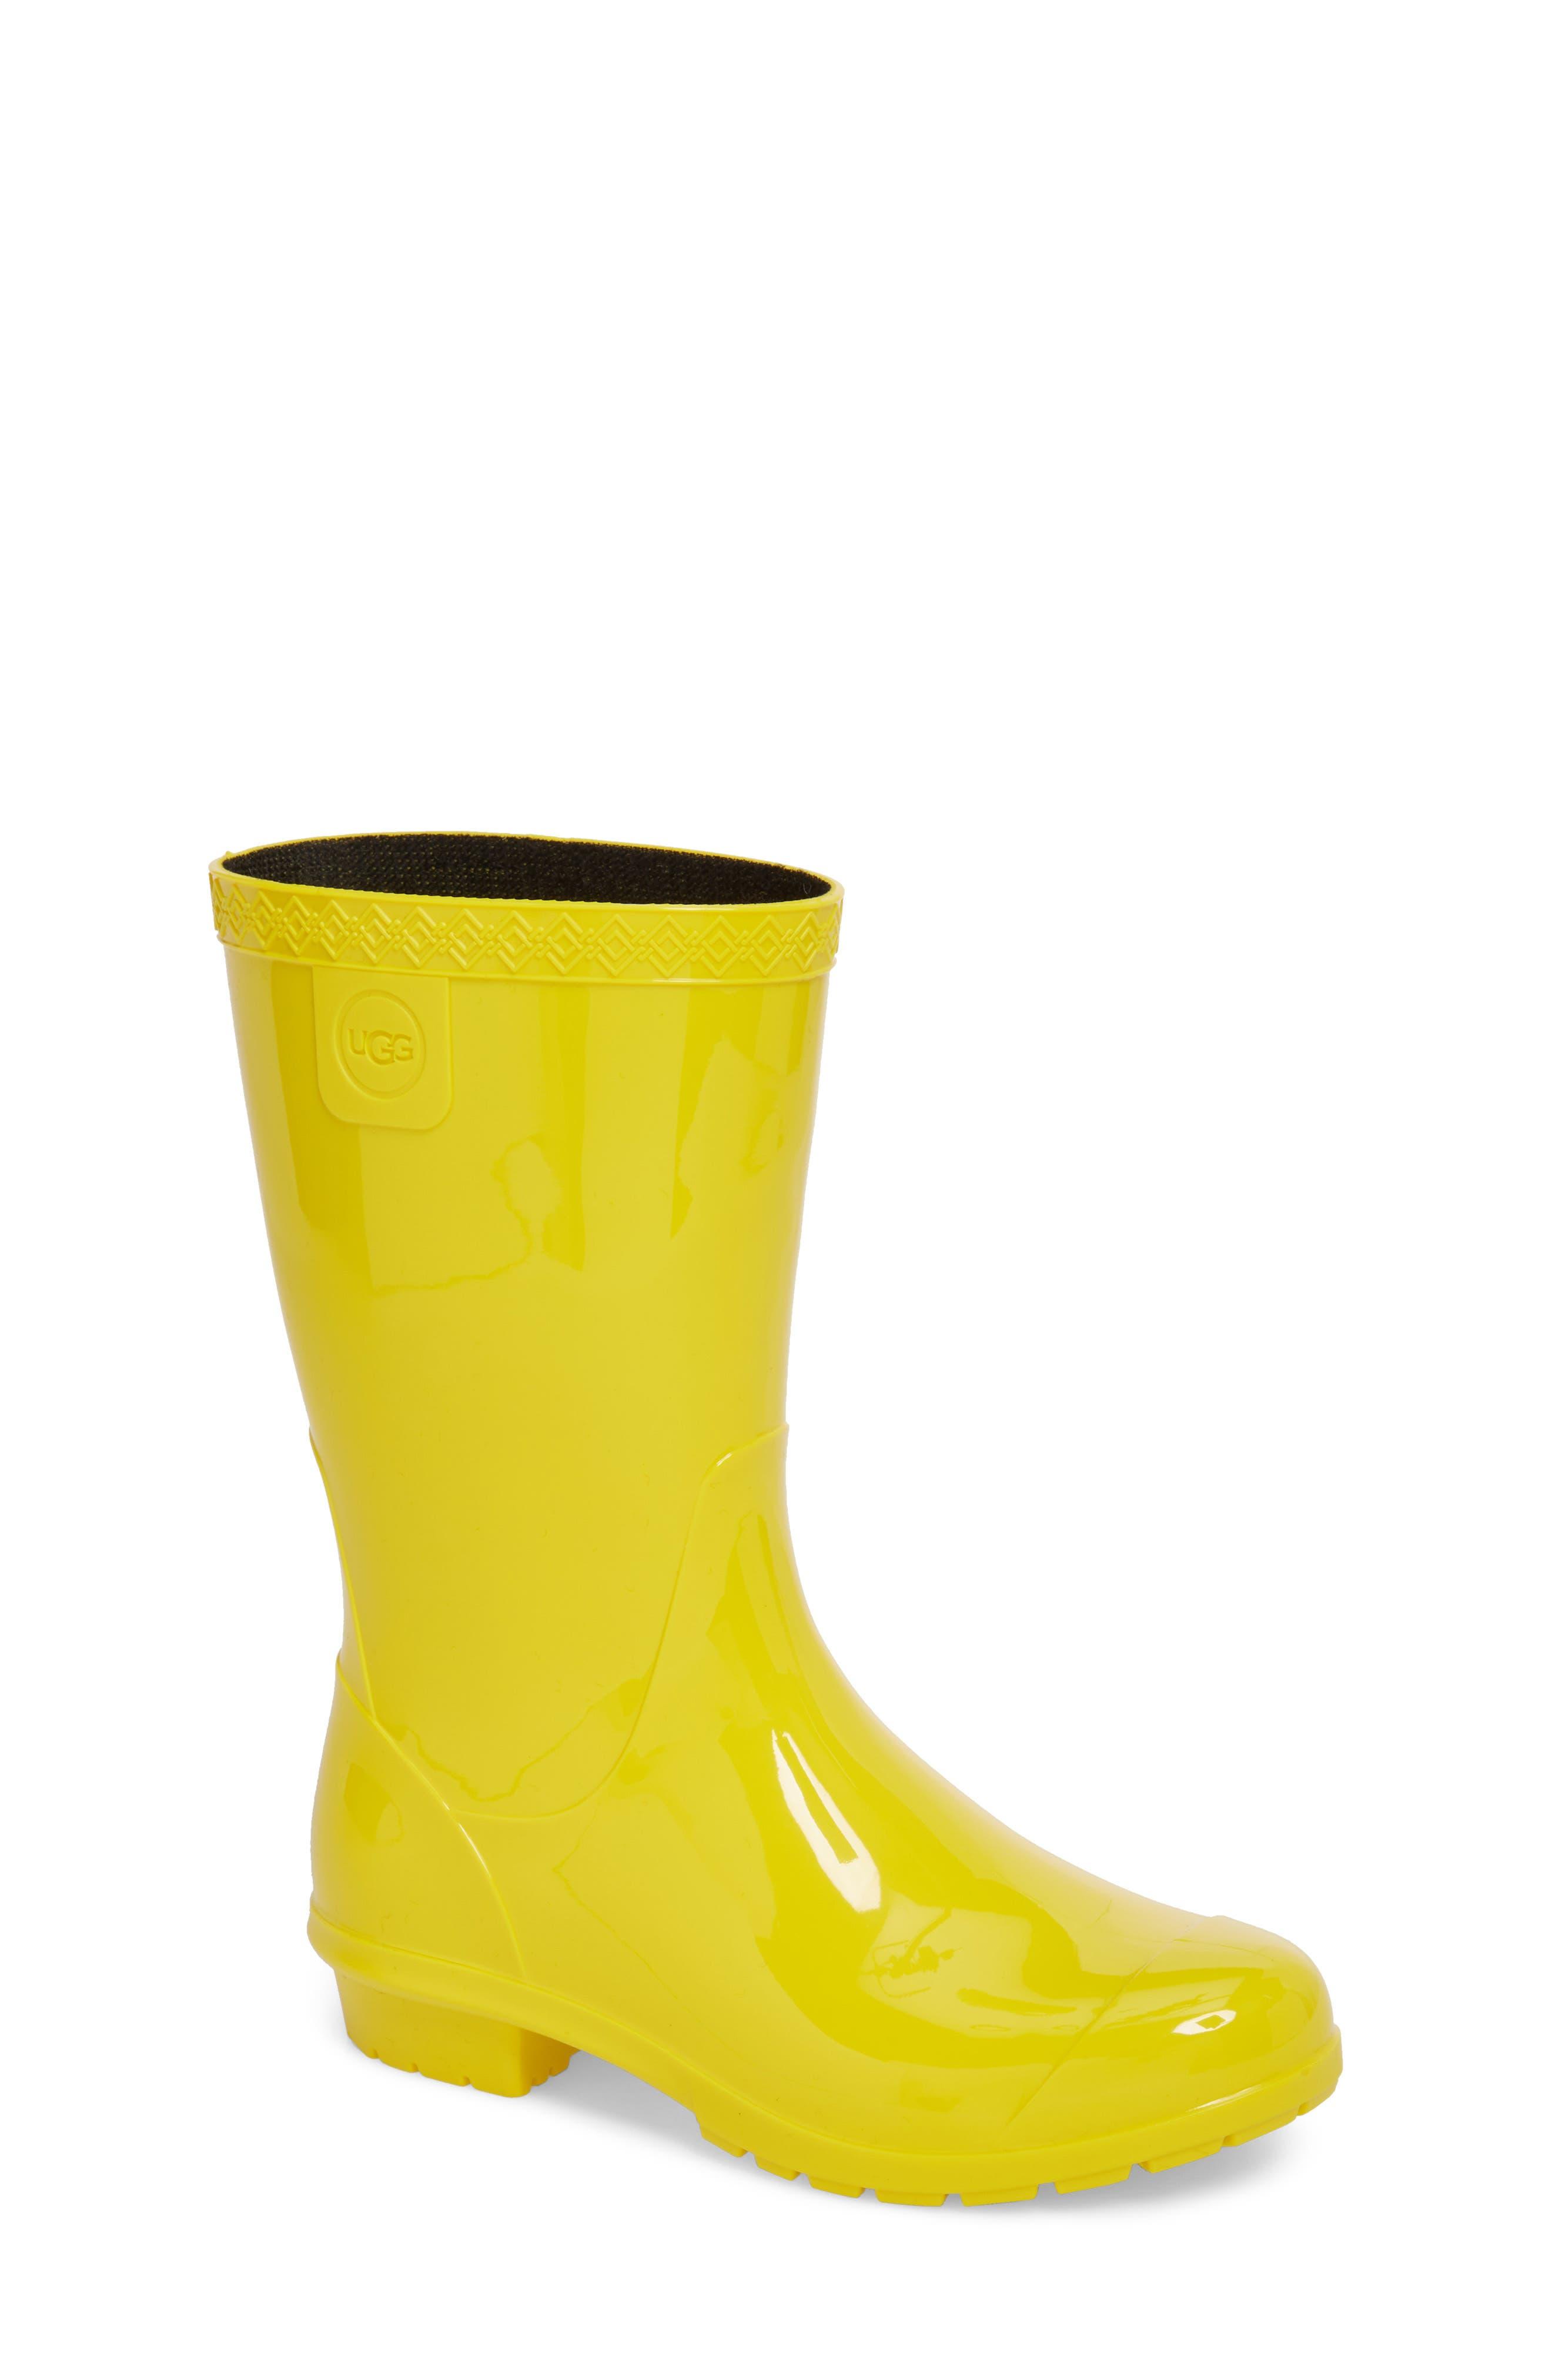 Raana Waterproof Rain Boot,                         Main,                         color, Lemon Yellow